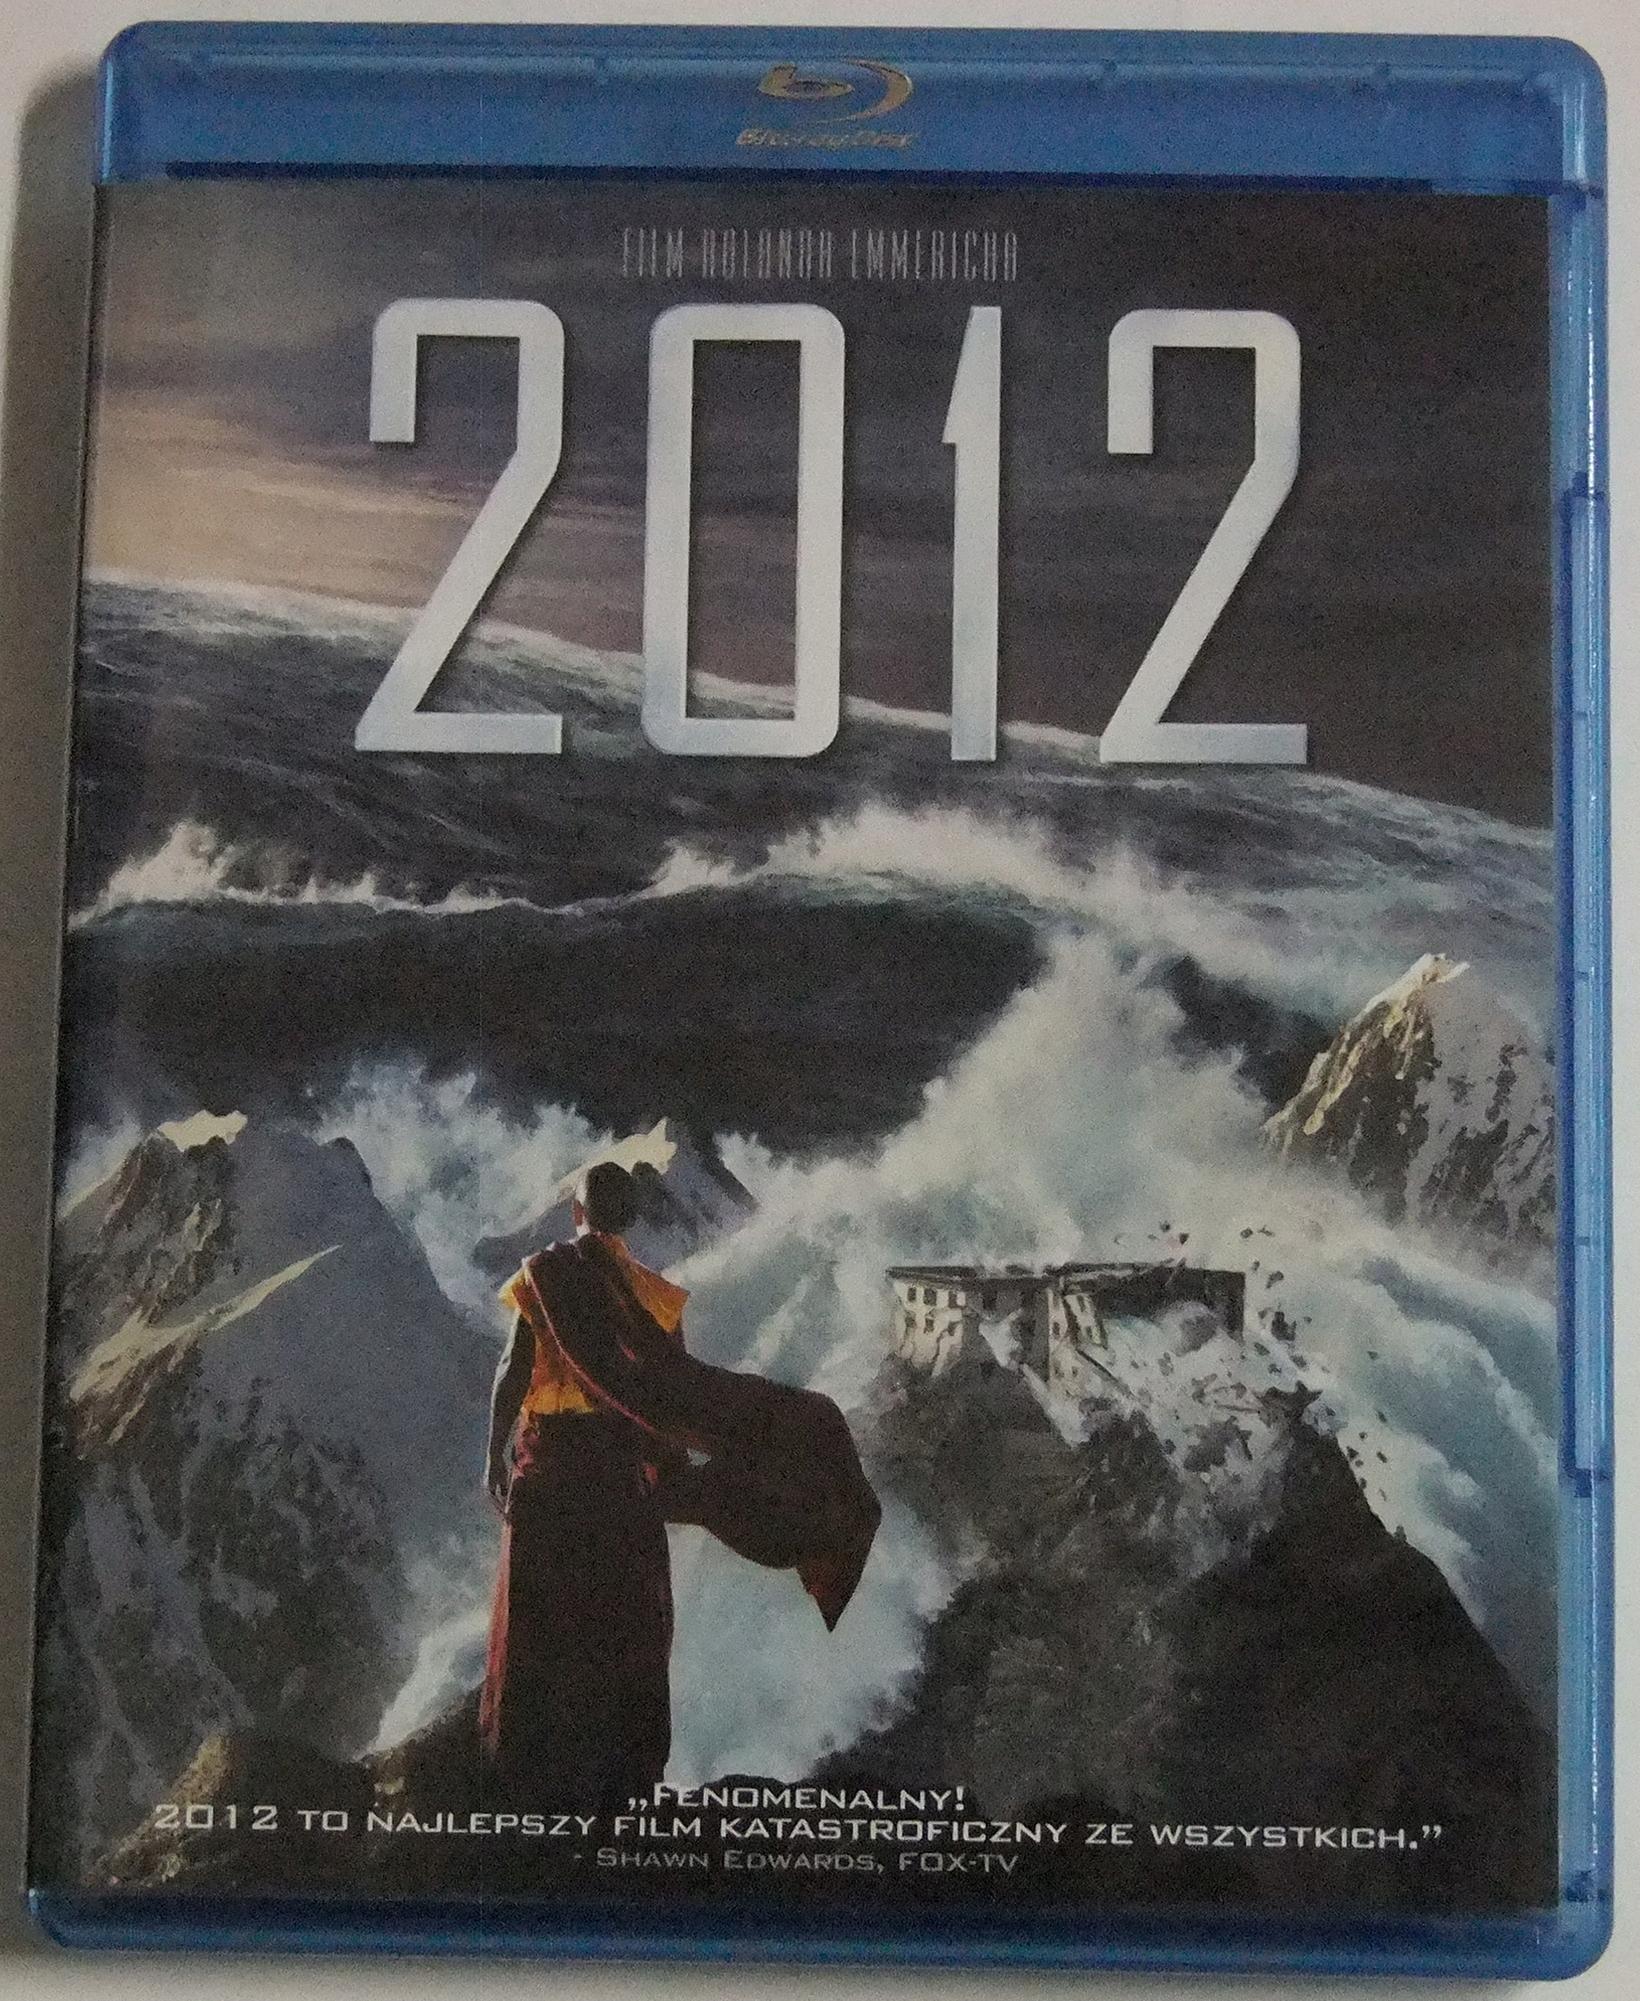 2012 Blu-Ray R12